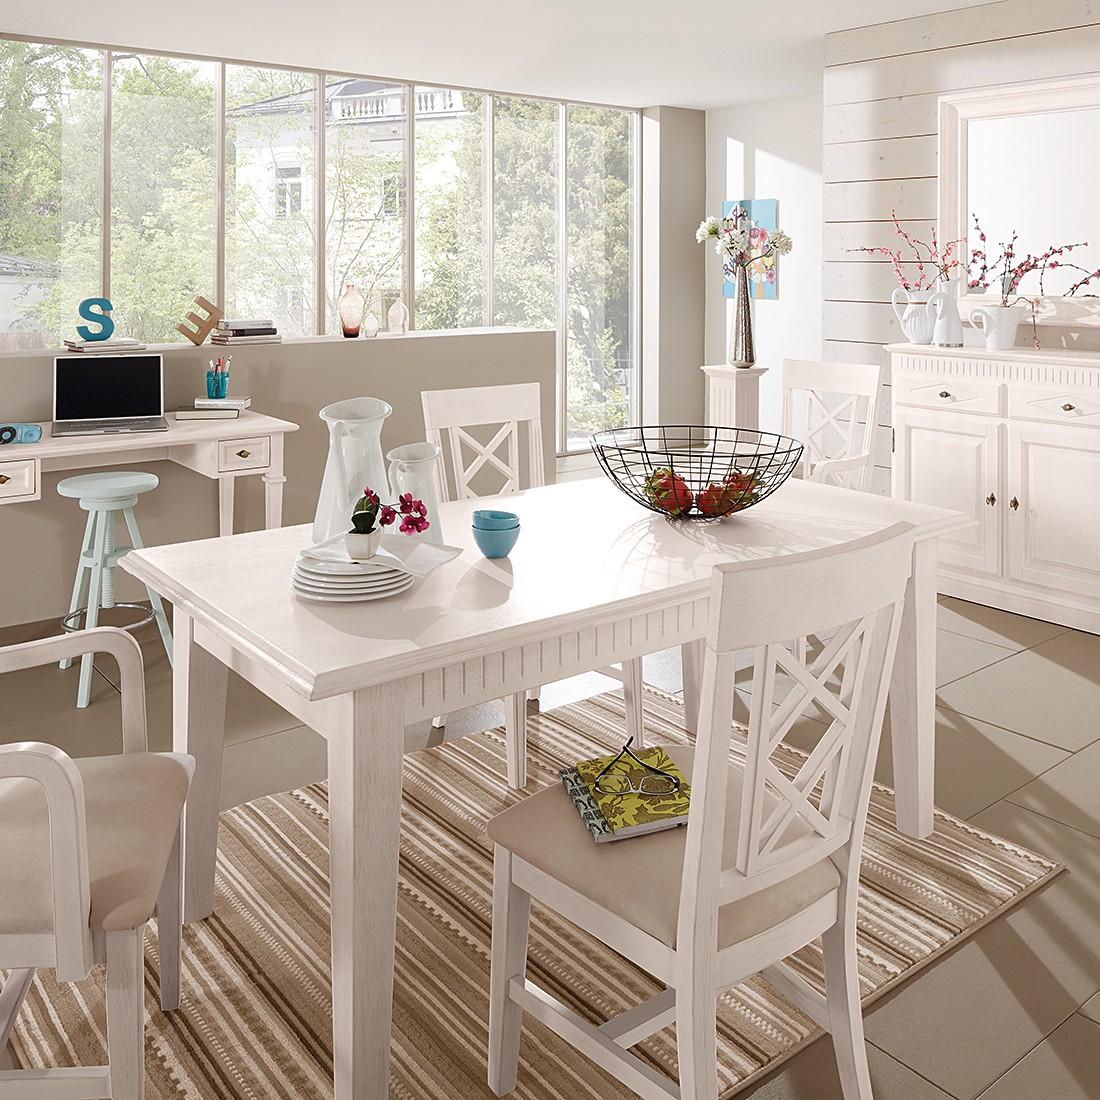 esszimmer landhaus creme perfect superior full size of ger umiges esszimmer landhaus idee mit. Black Bedroom Furniture Sets. Home Design Ideas